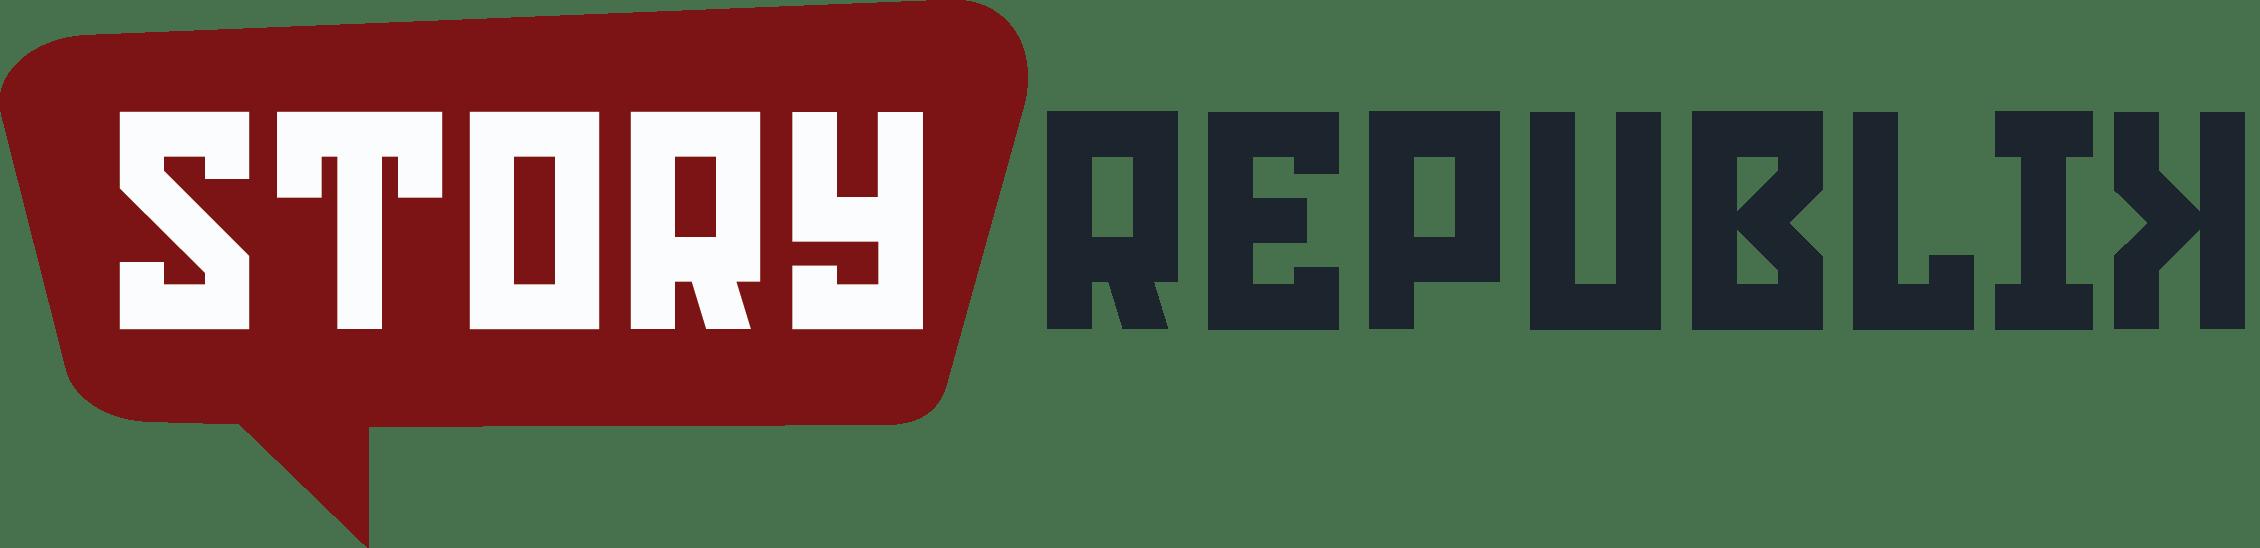 Story Republik Red